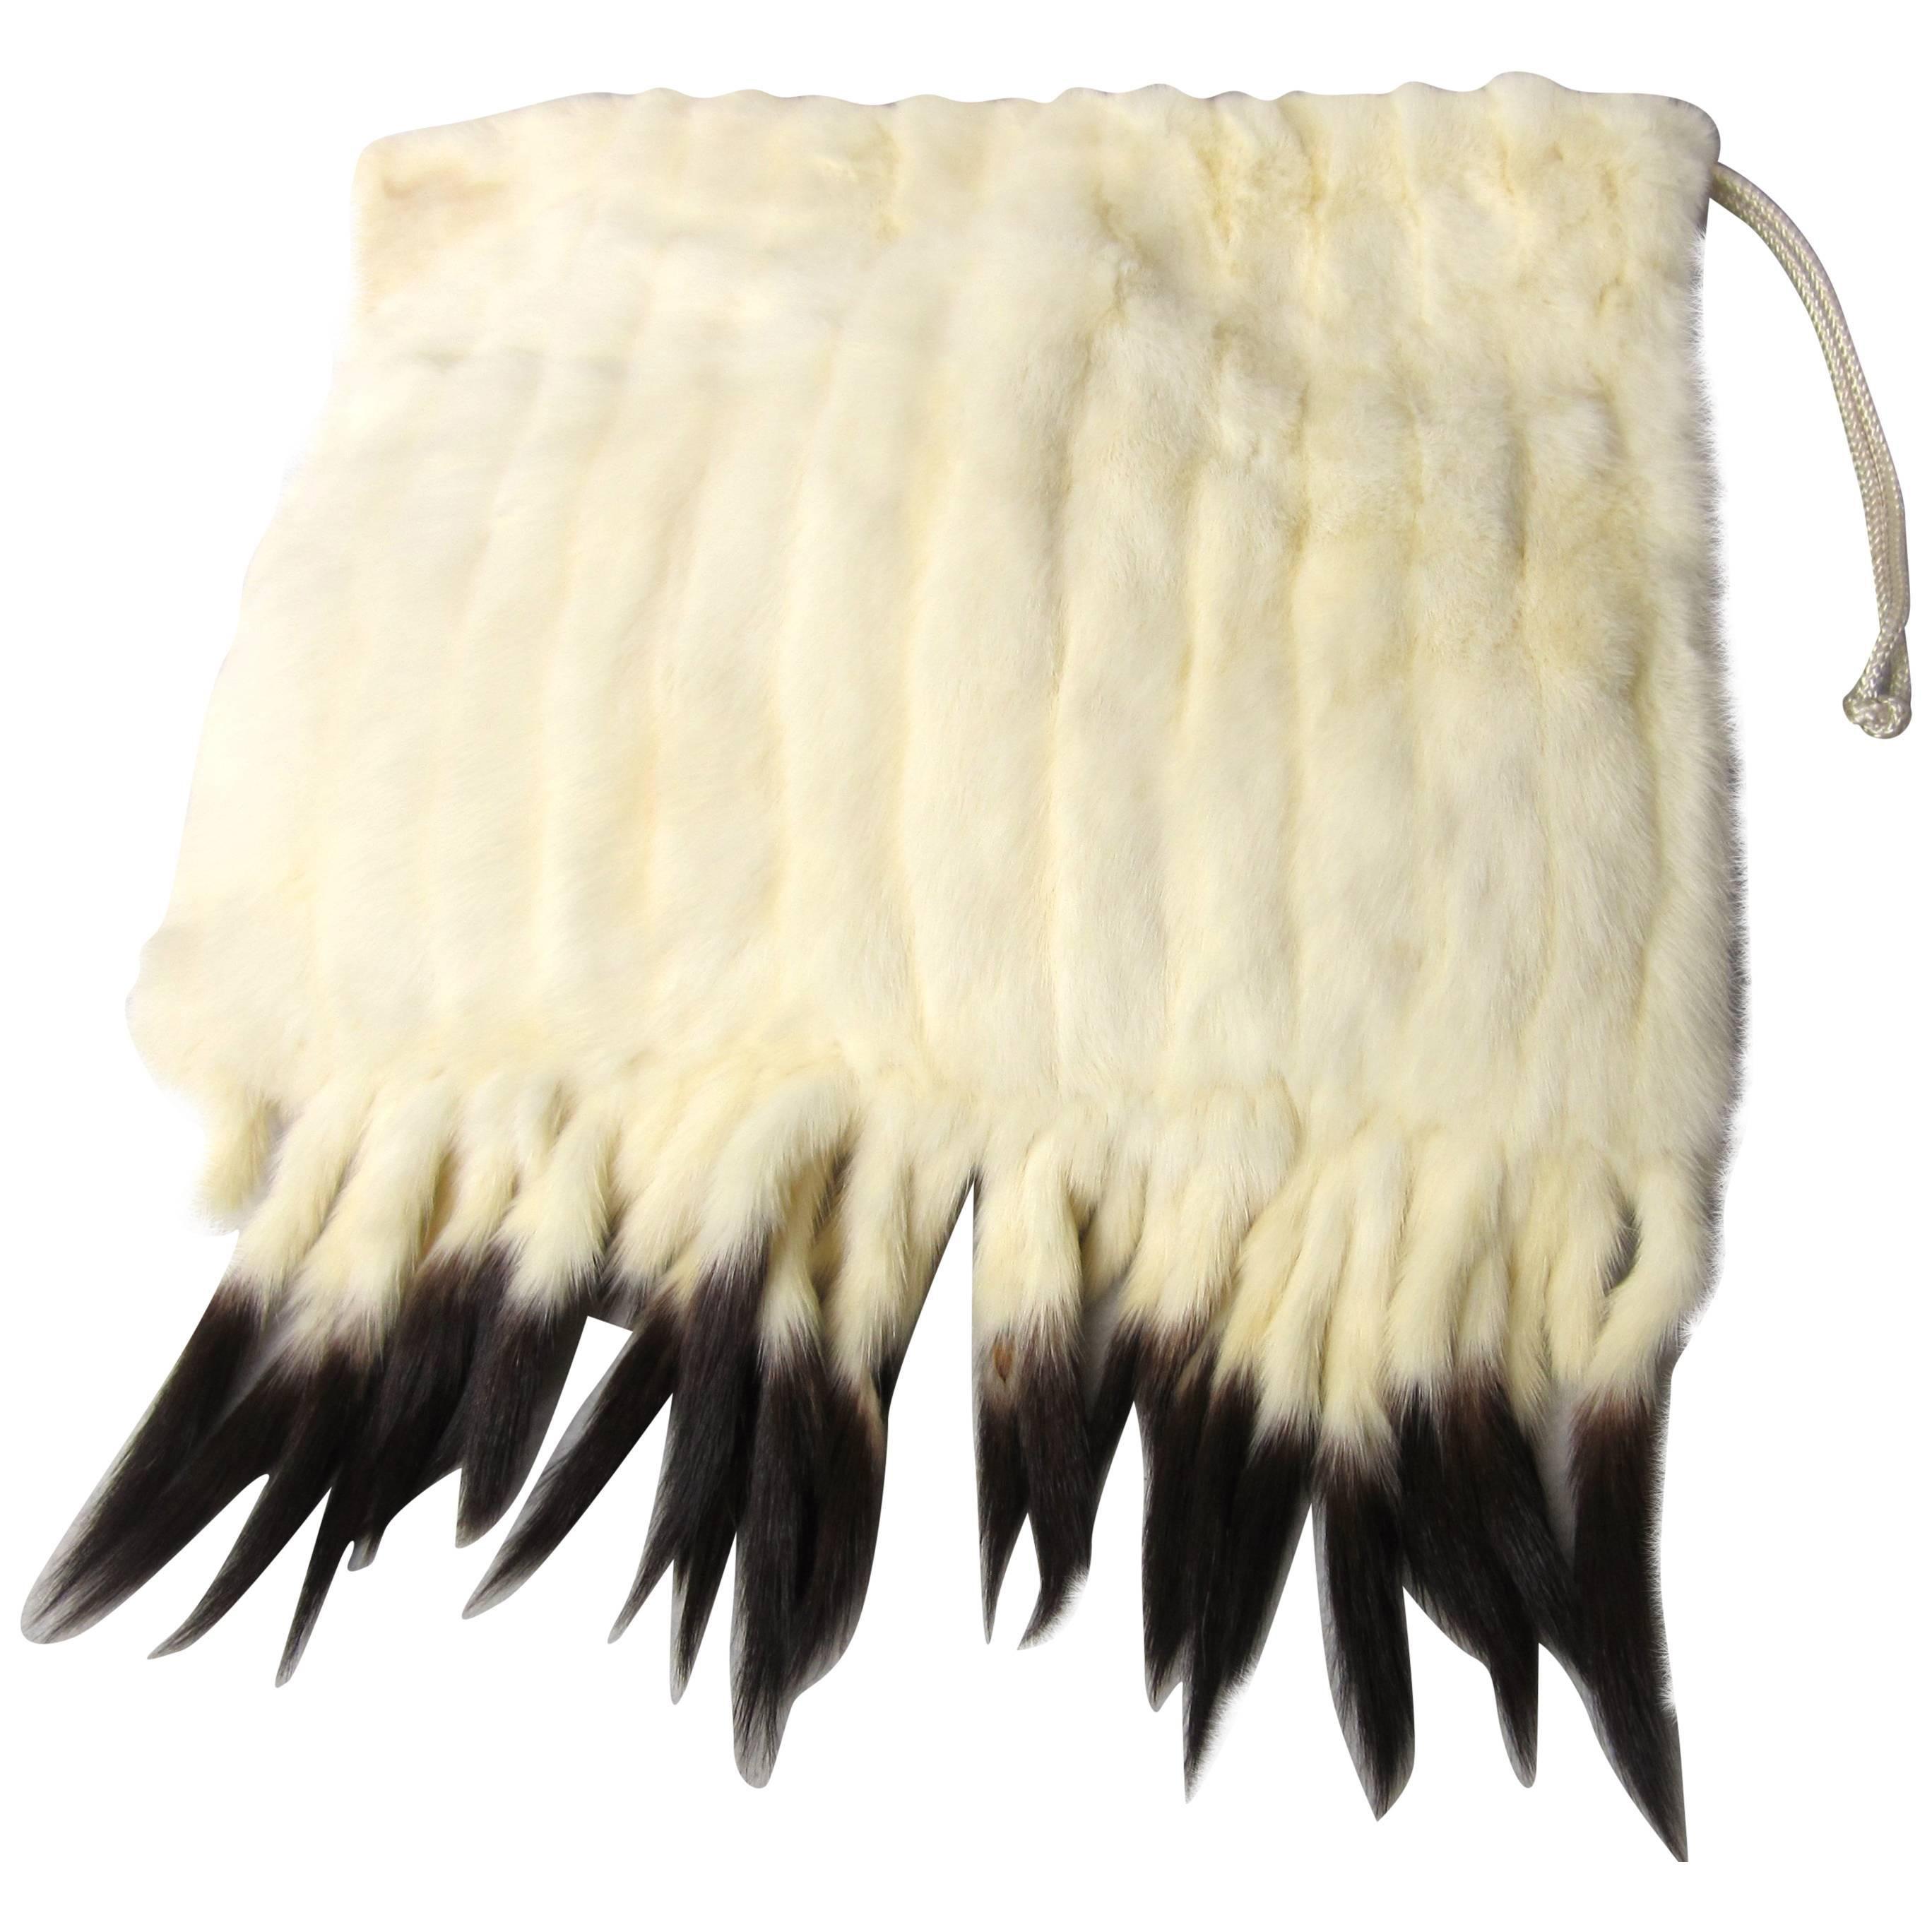 1stdibs Vintage 1920s White Ermine Fur Muff Handbag MFehhi